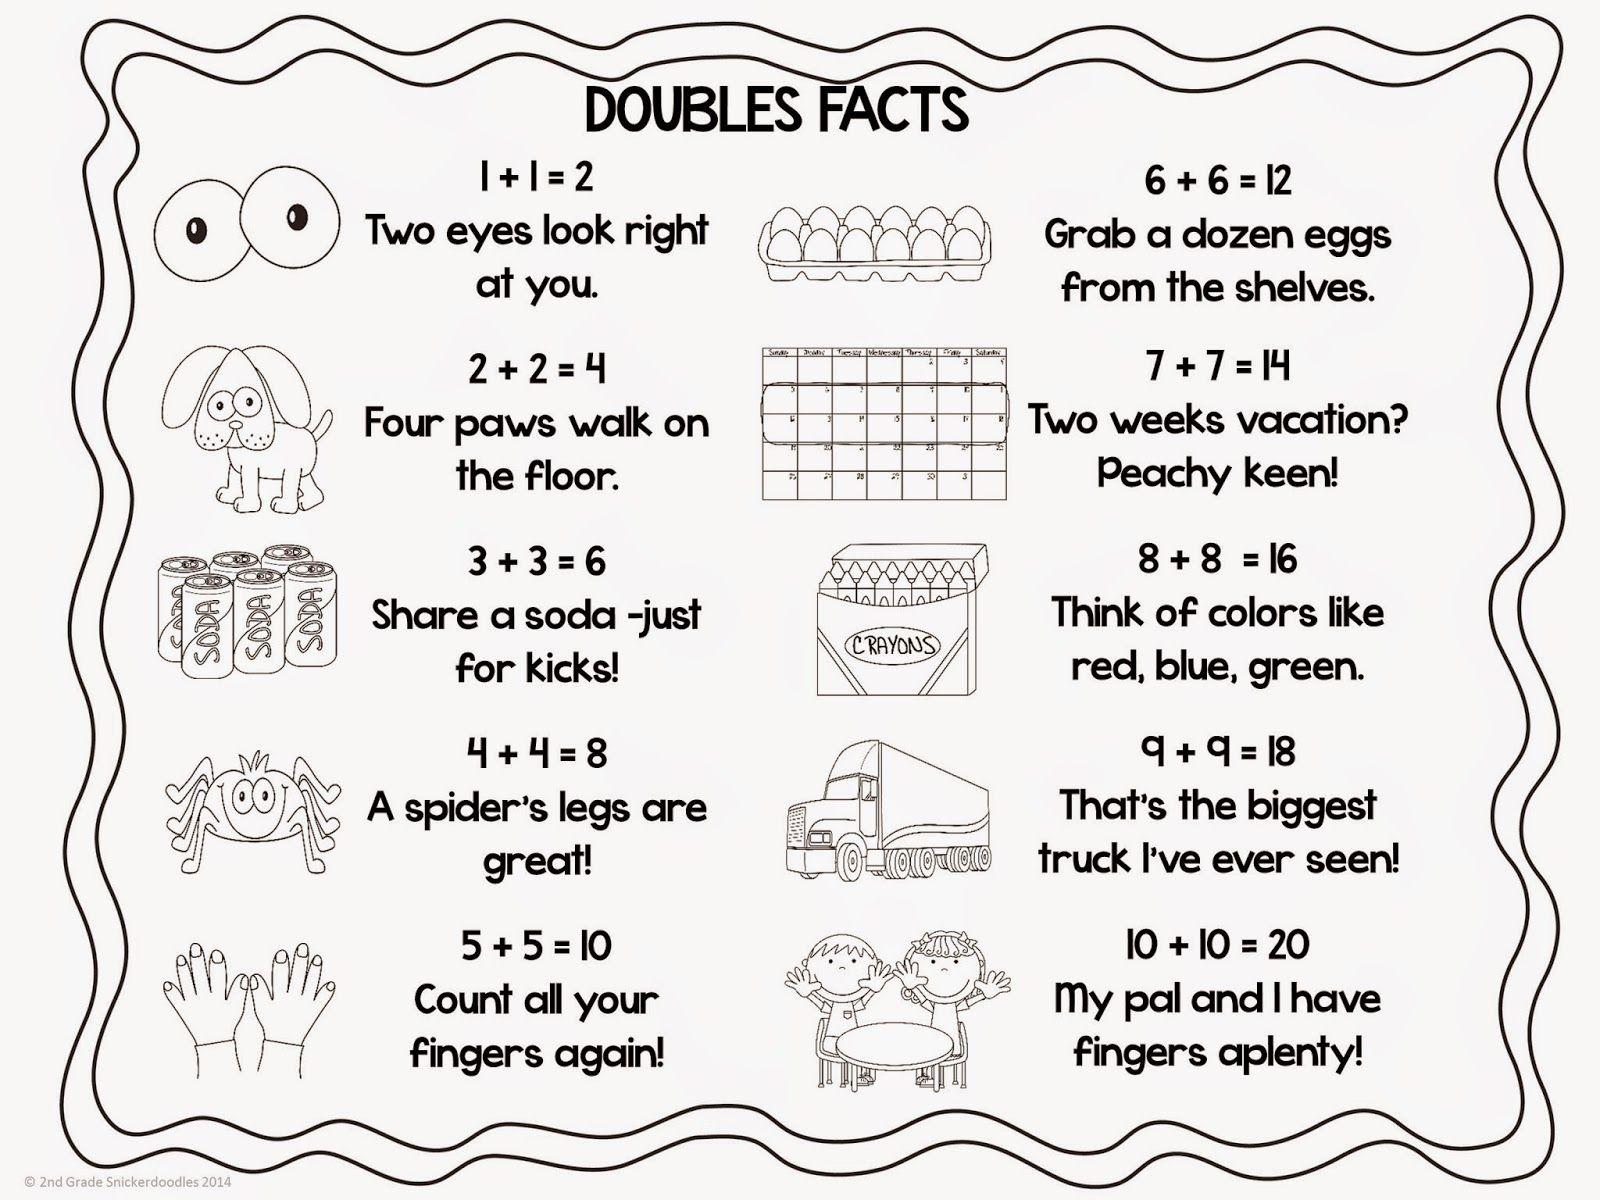 2nd Grade Snickerdoodles: Doubles Facts Freebie | SecondGradeSquad ...